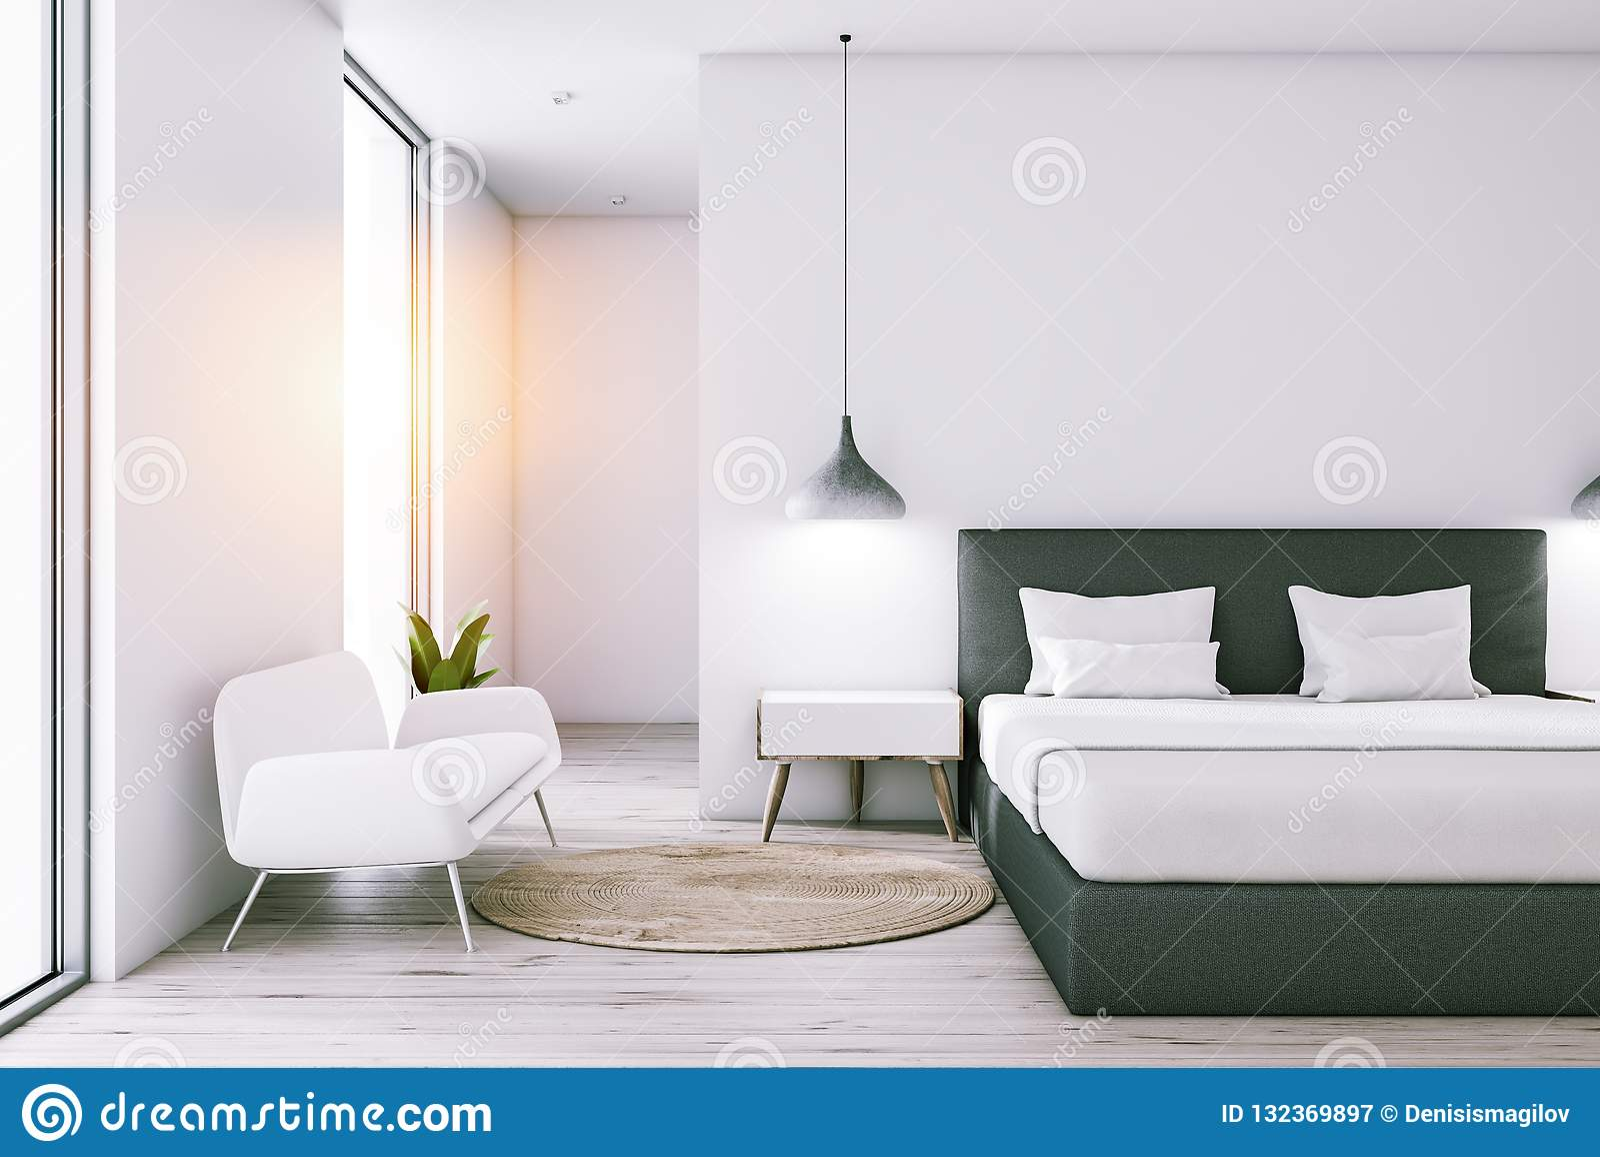 White bedroom with sofa stock illustration. Illustration of